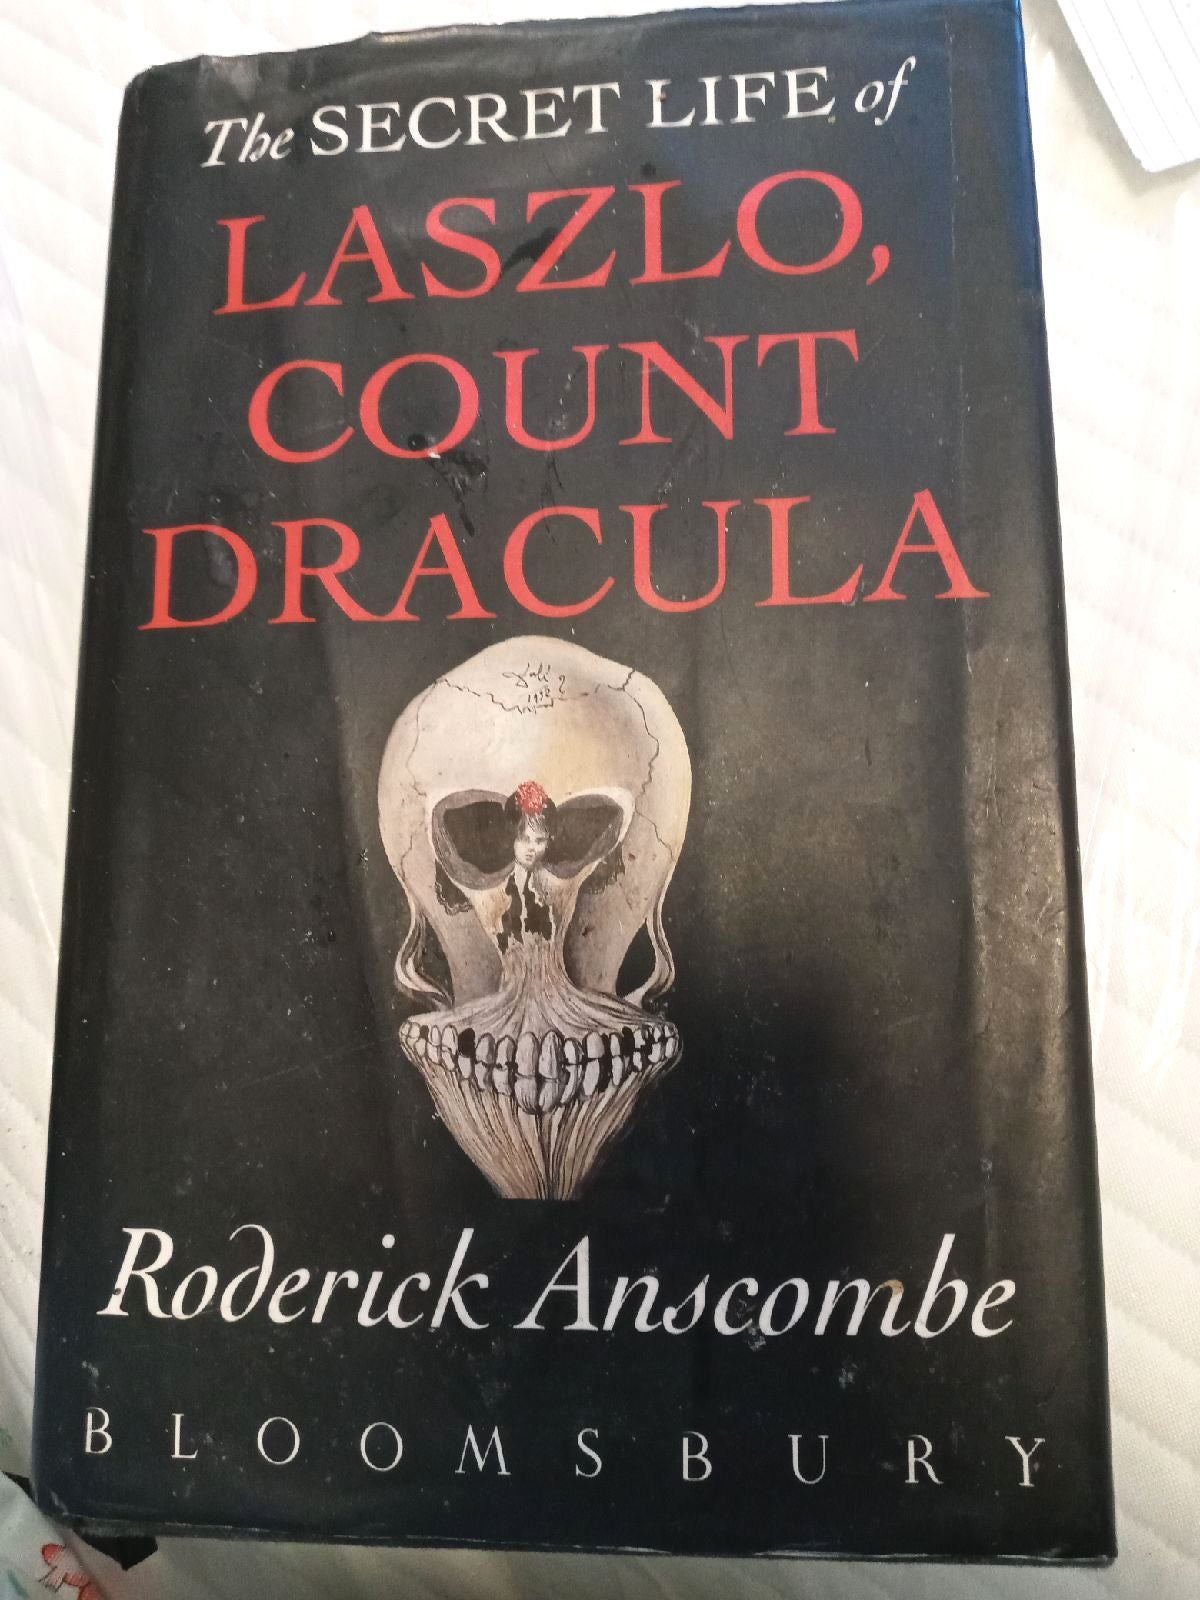 The Secret life of Laszlo Count Dracula